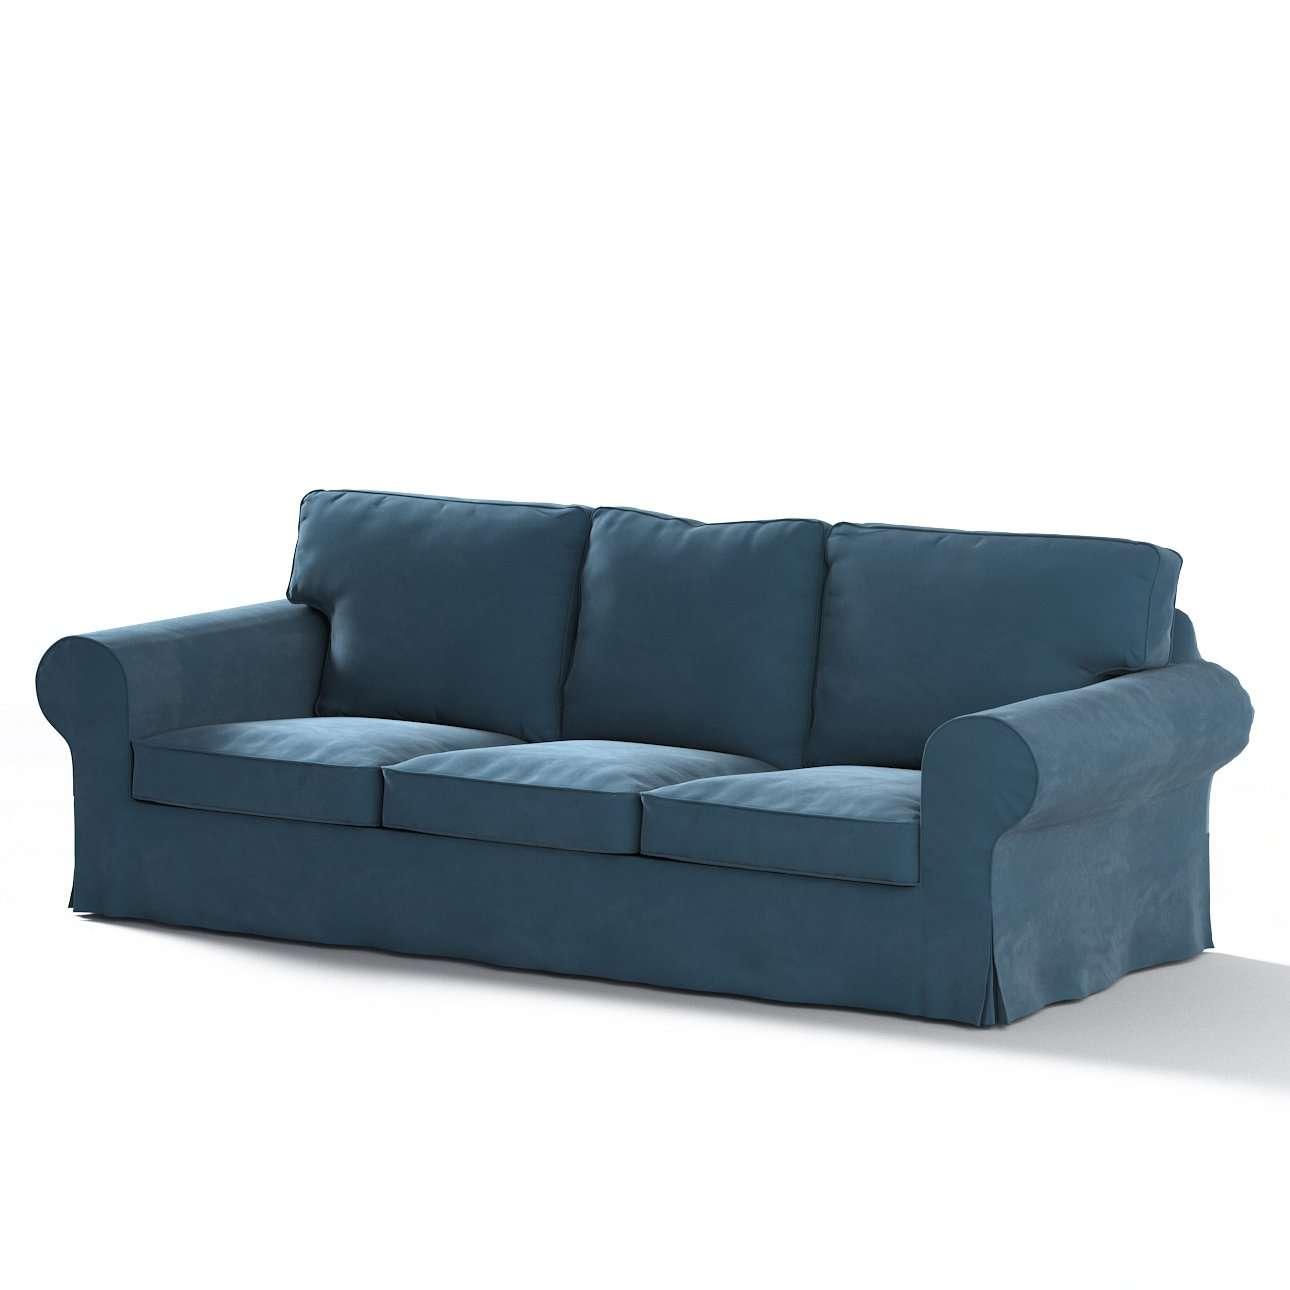 Pleasing Ektorp 3 Seater Sofa Cover Download Free Architecture Designs Rallybritishbridgeorg